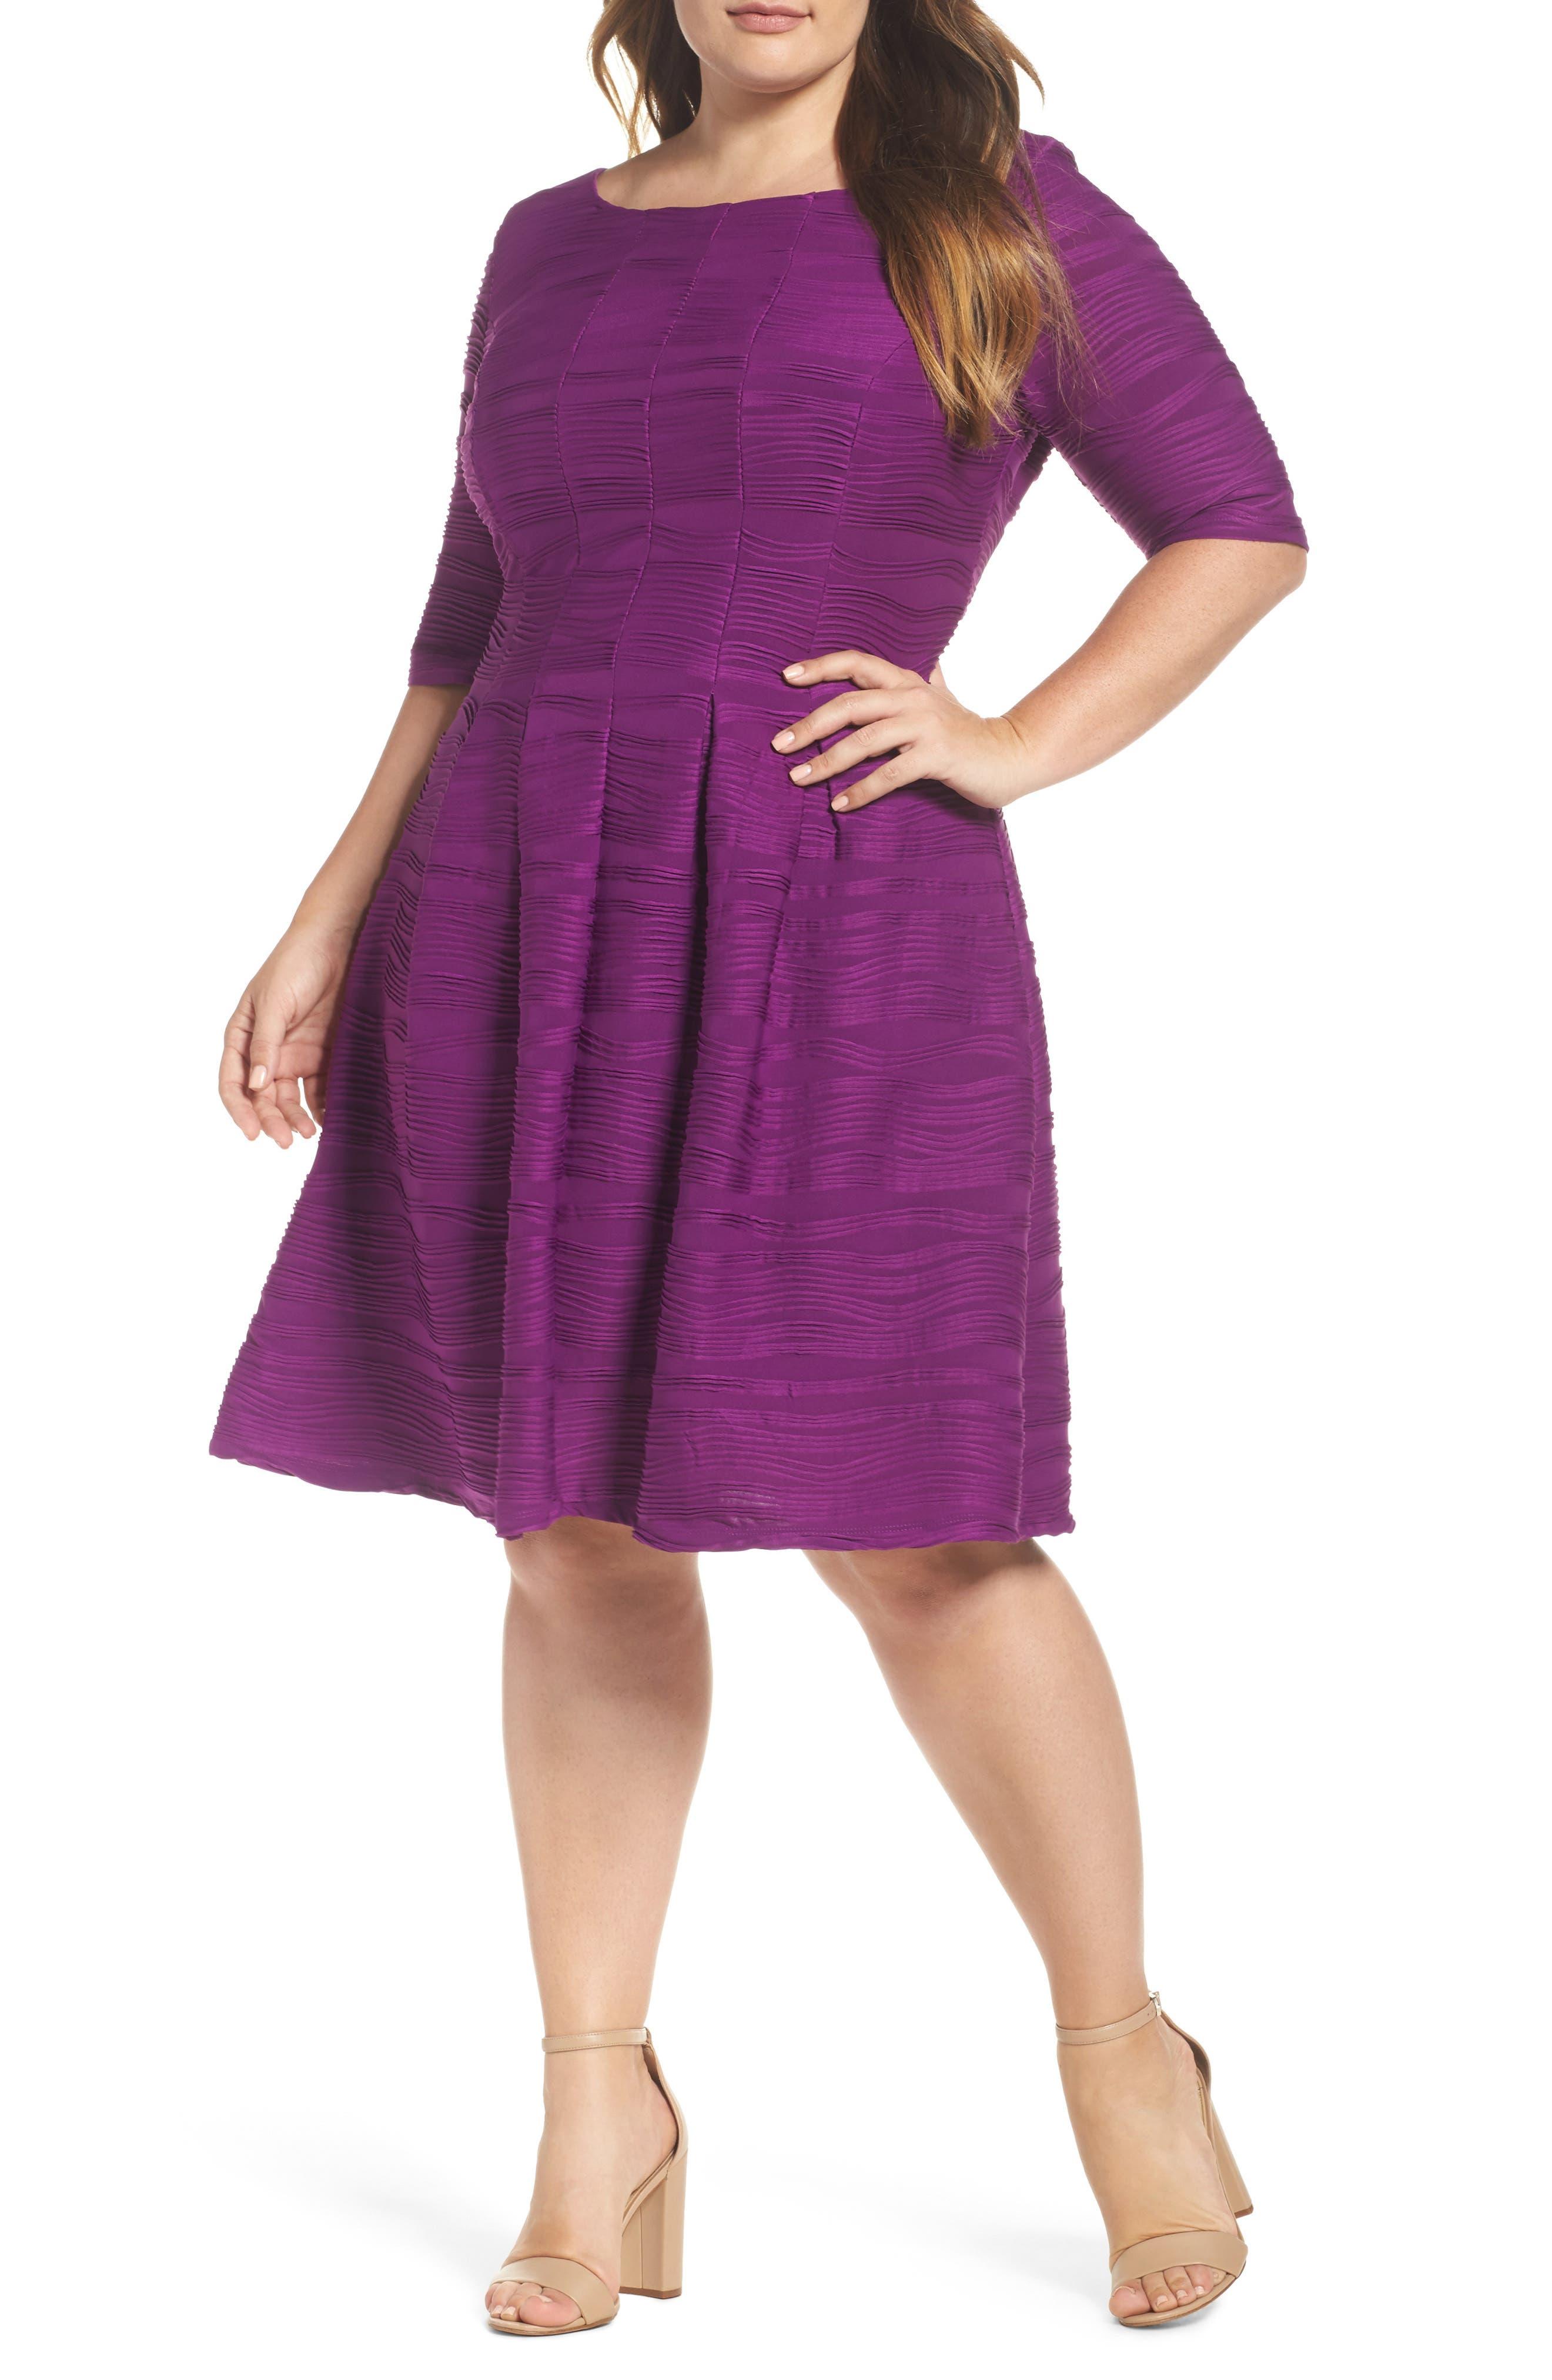 Gabby Skye Wave Knit Fit & Flare Dress (Plus Size)